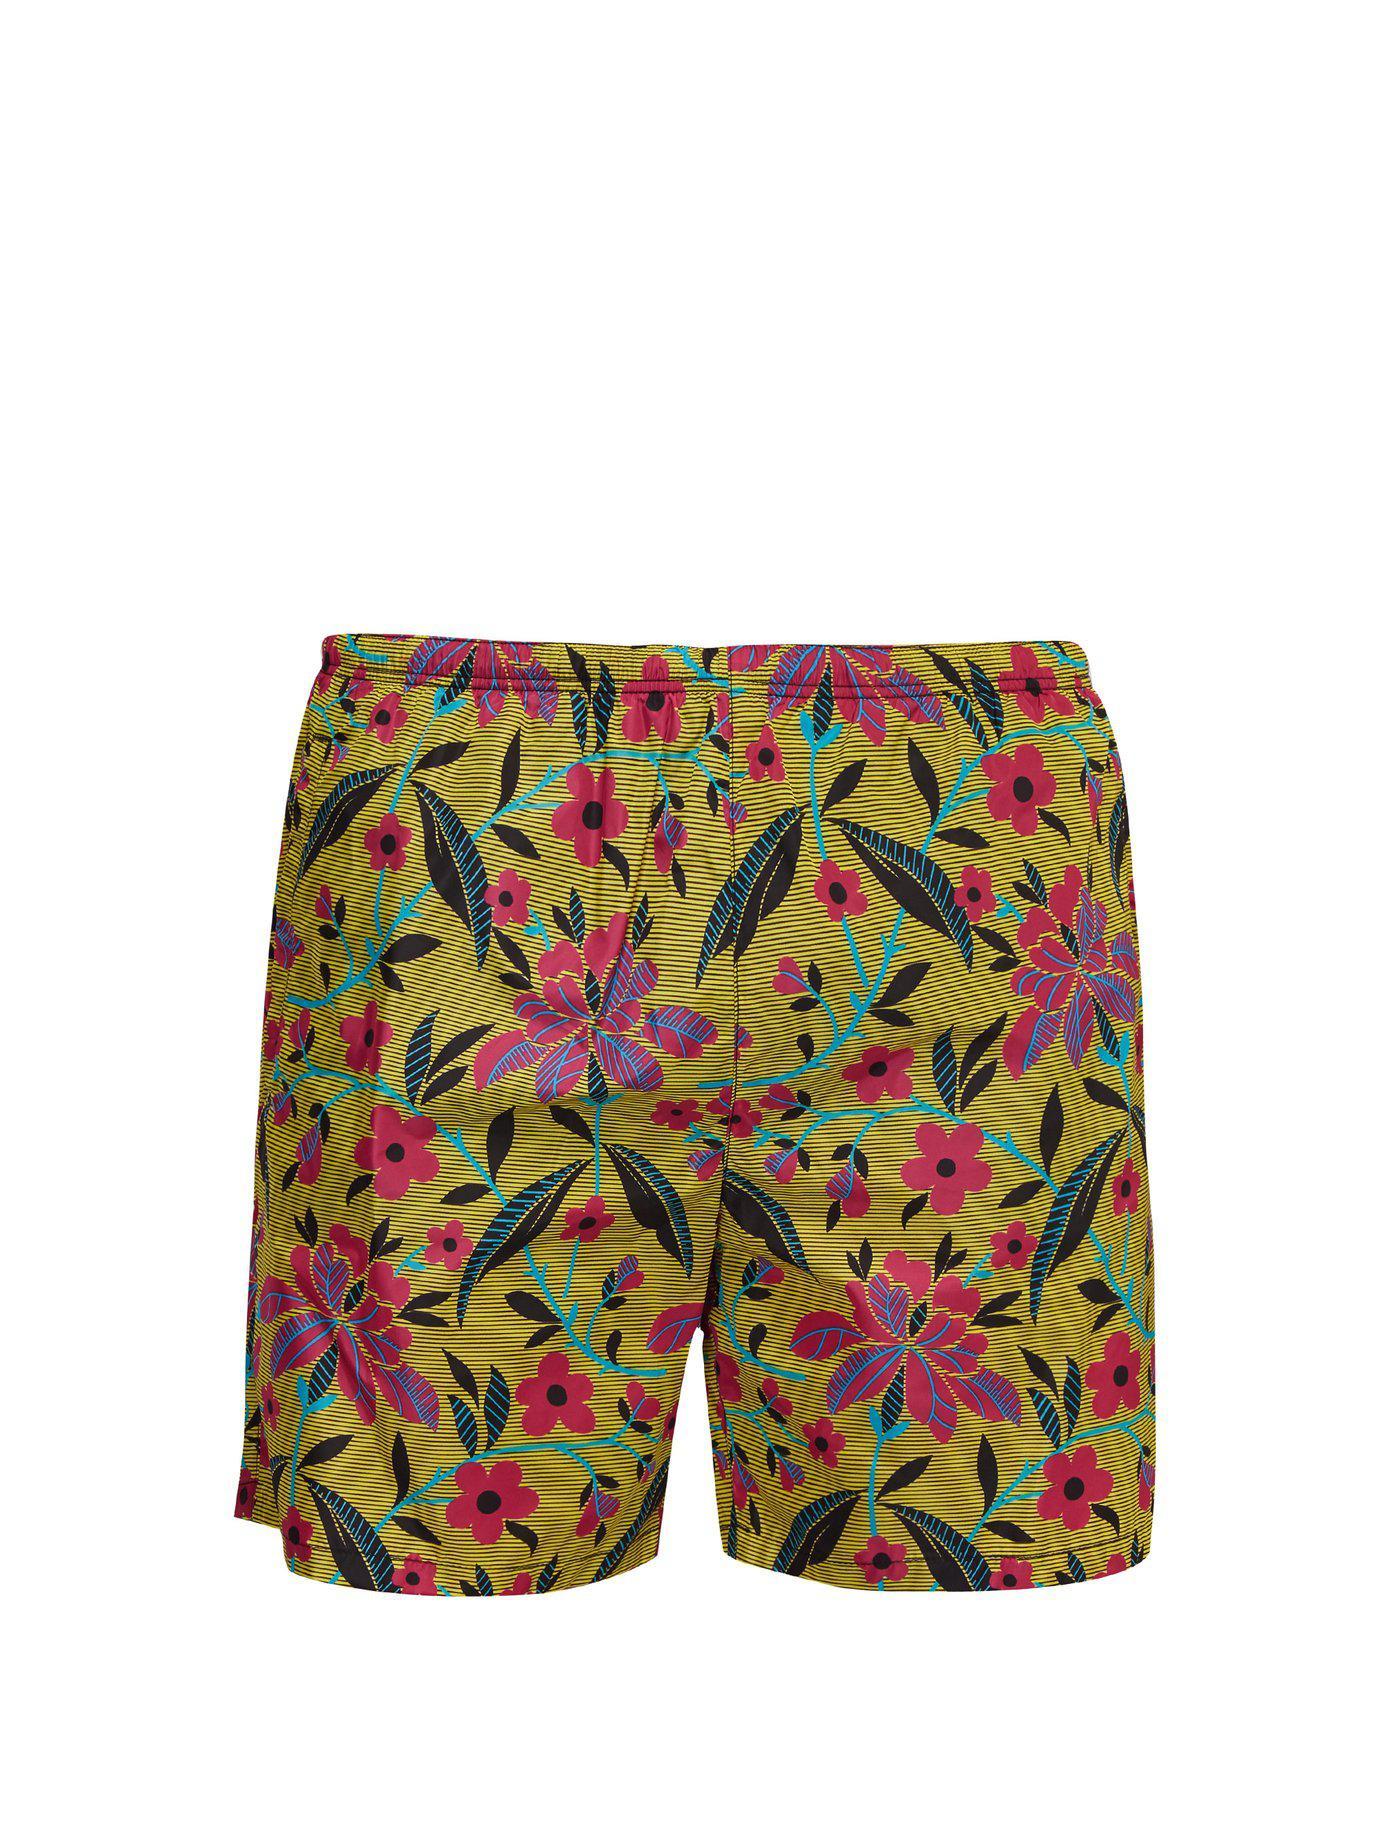 e584de1507 Lyst - Prada Striped Floral Print Swim Shorts for Men